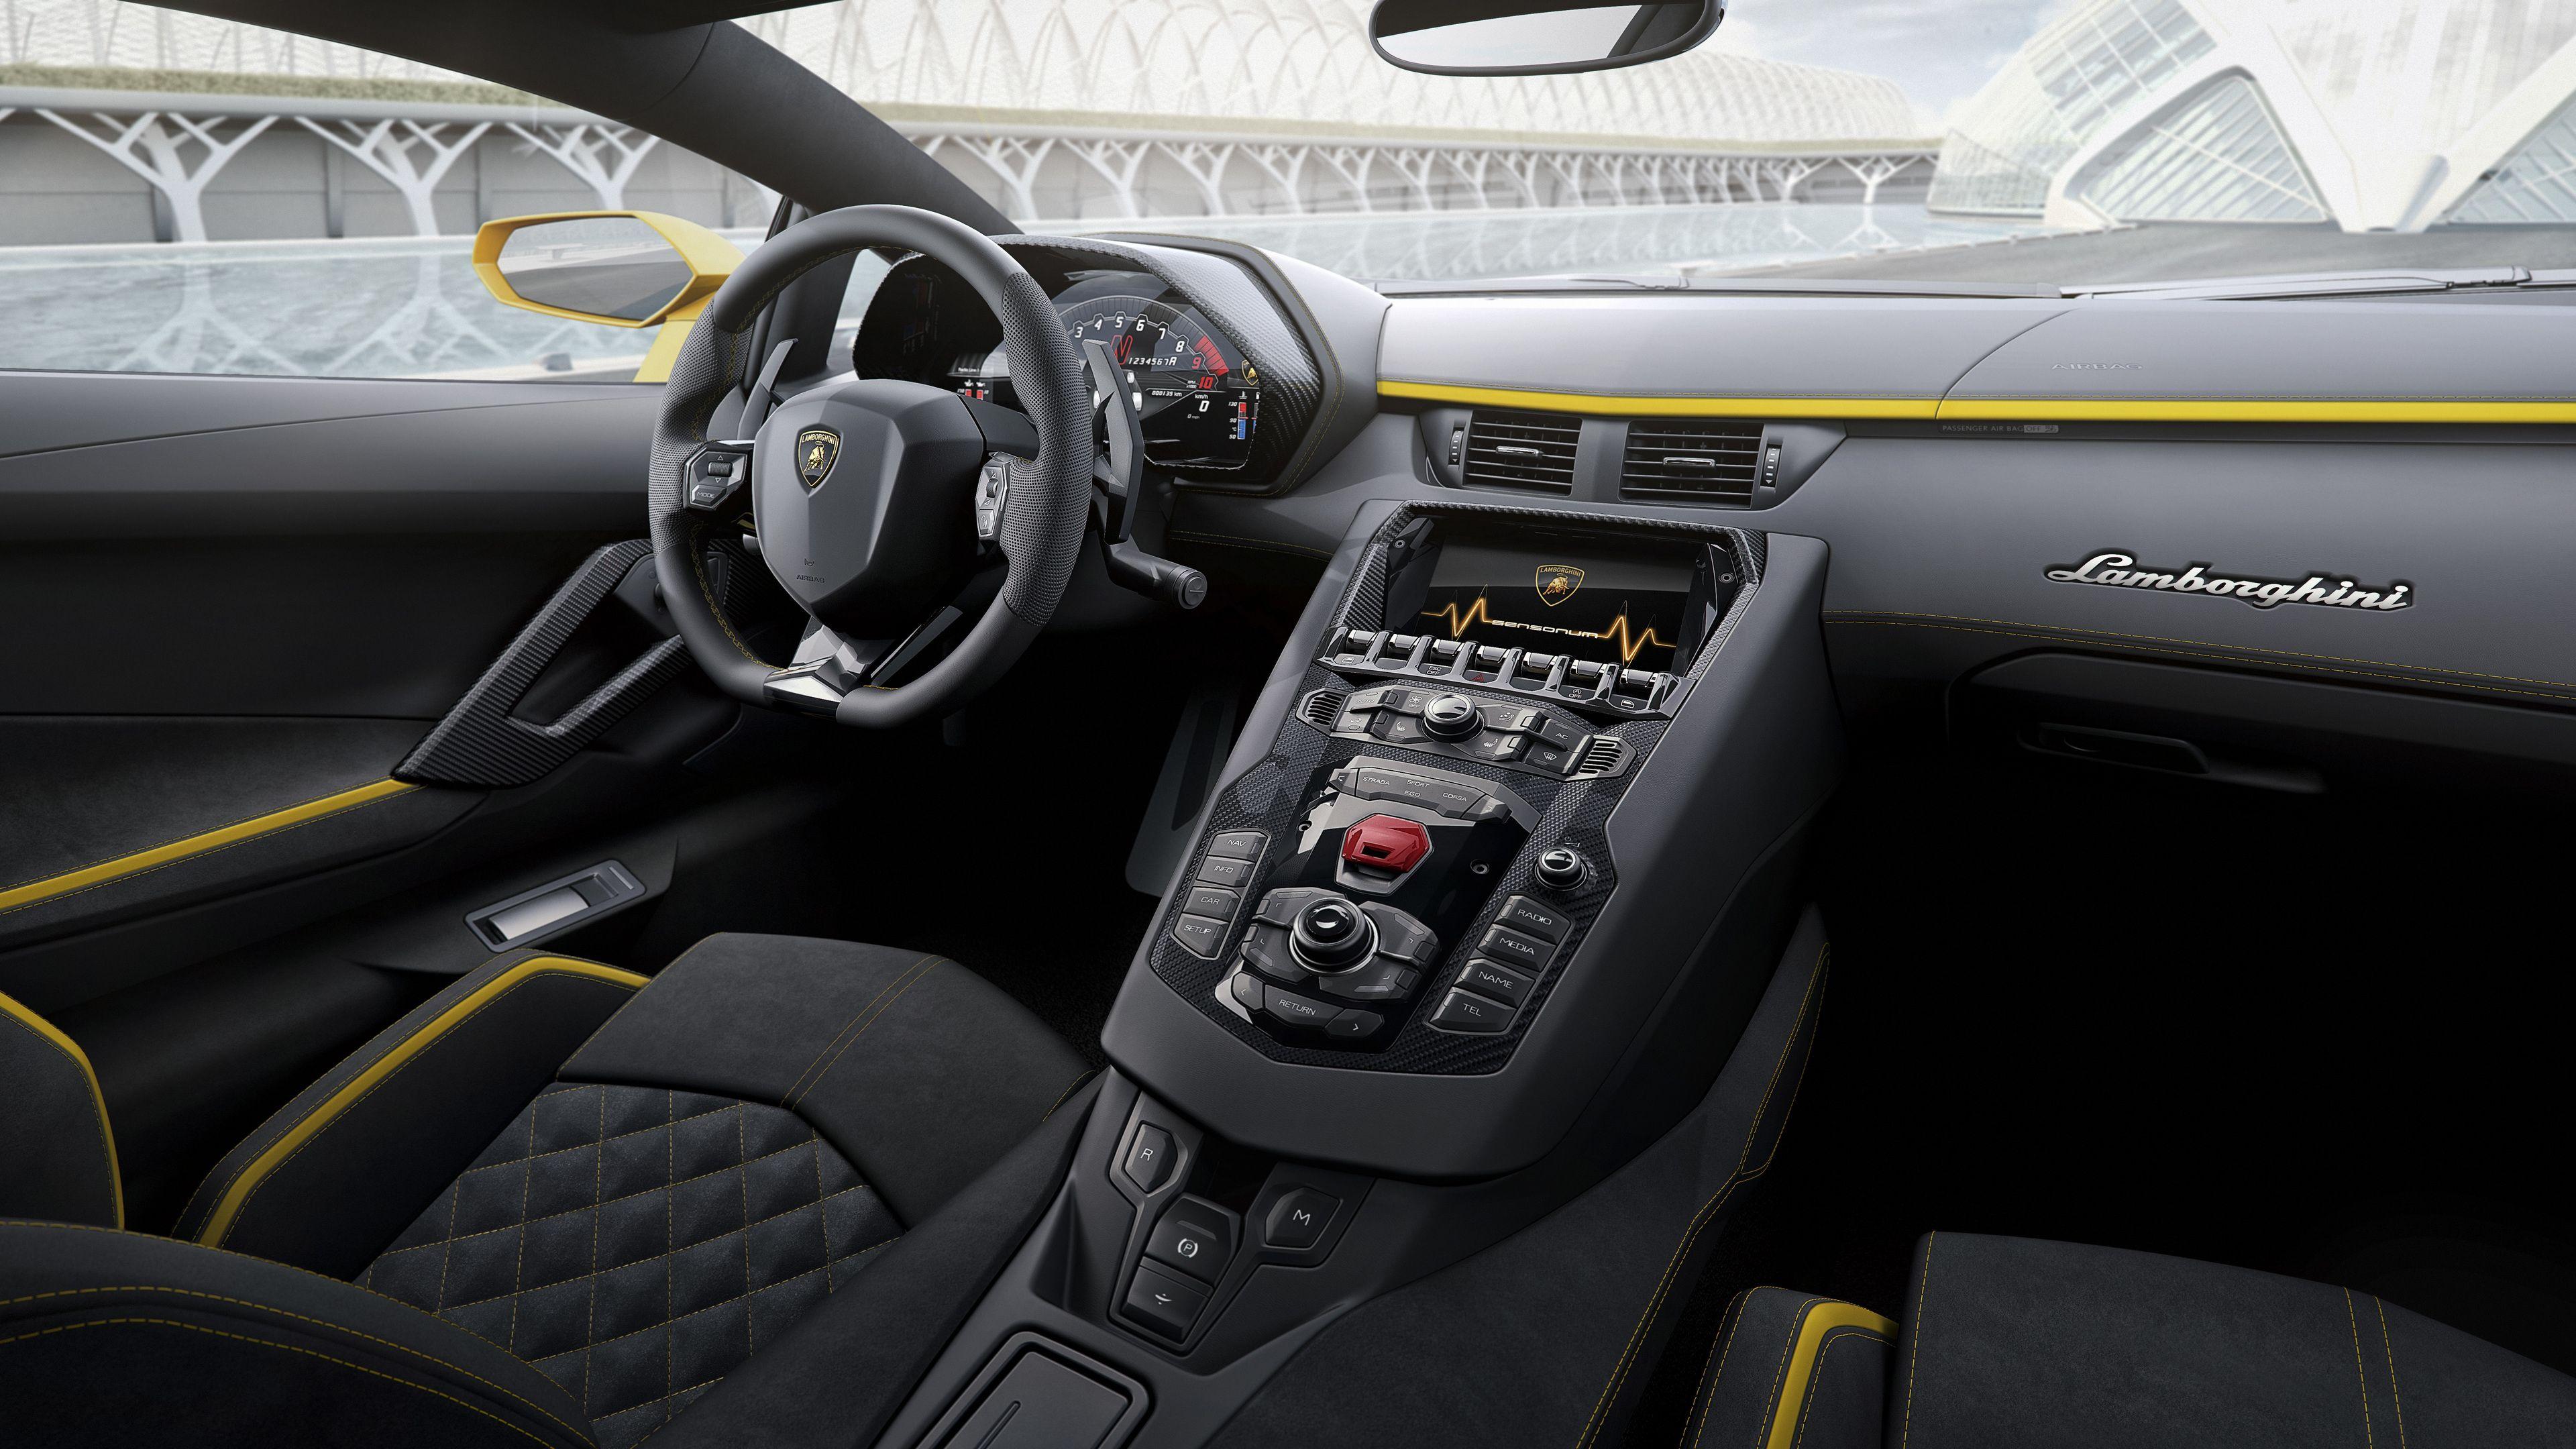 2017 Lamborghini Aventador S Interior 8k Lamborghini